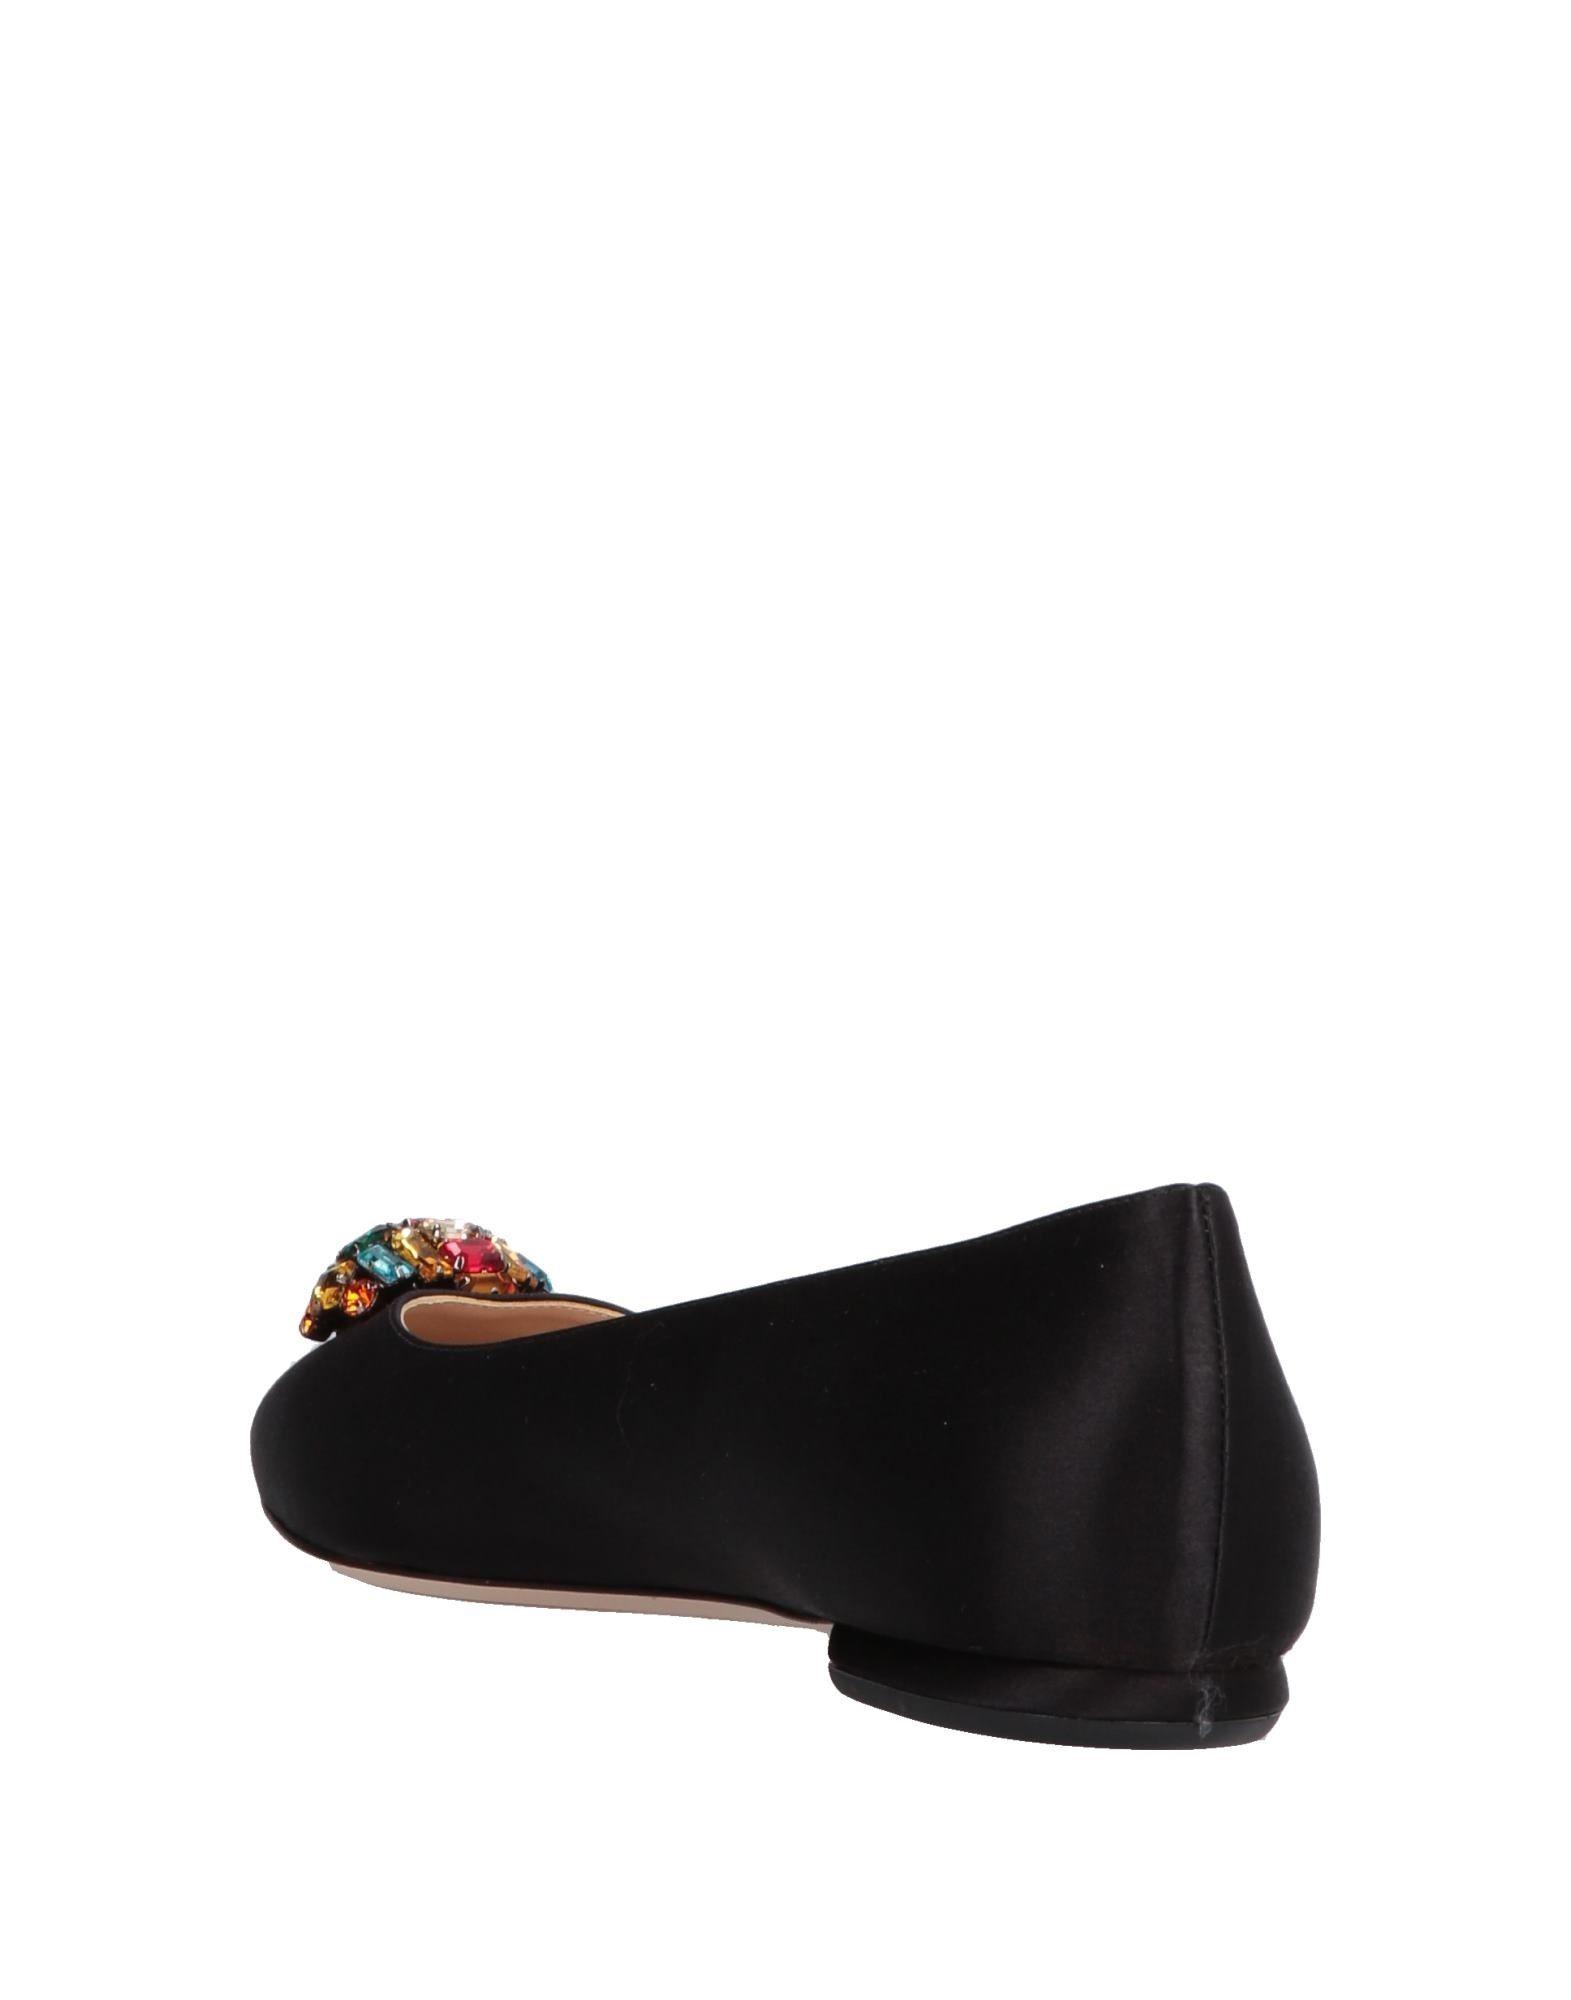 Stilvolle billige Schuhe Damen Deimille Ballerinas Damen Schuhe  11562293OJ 9cec20